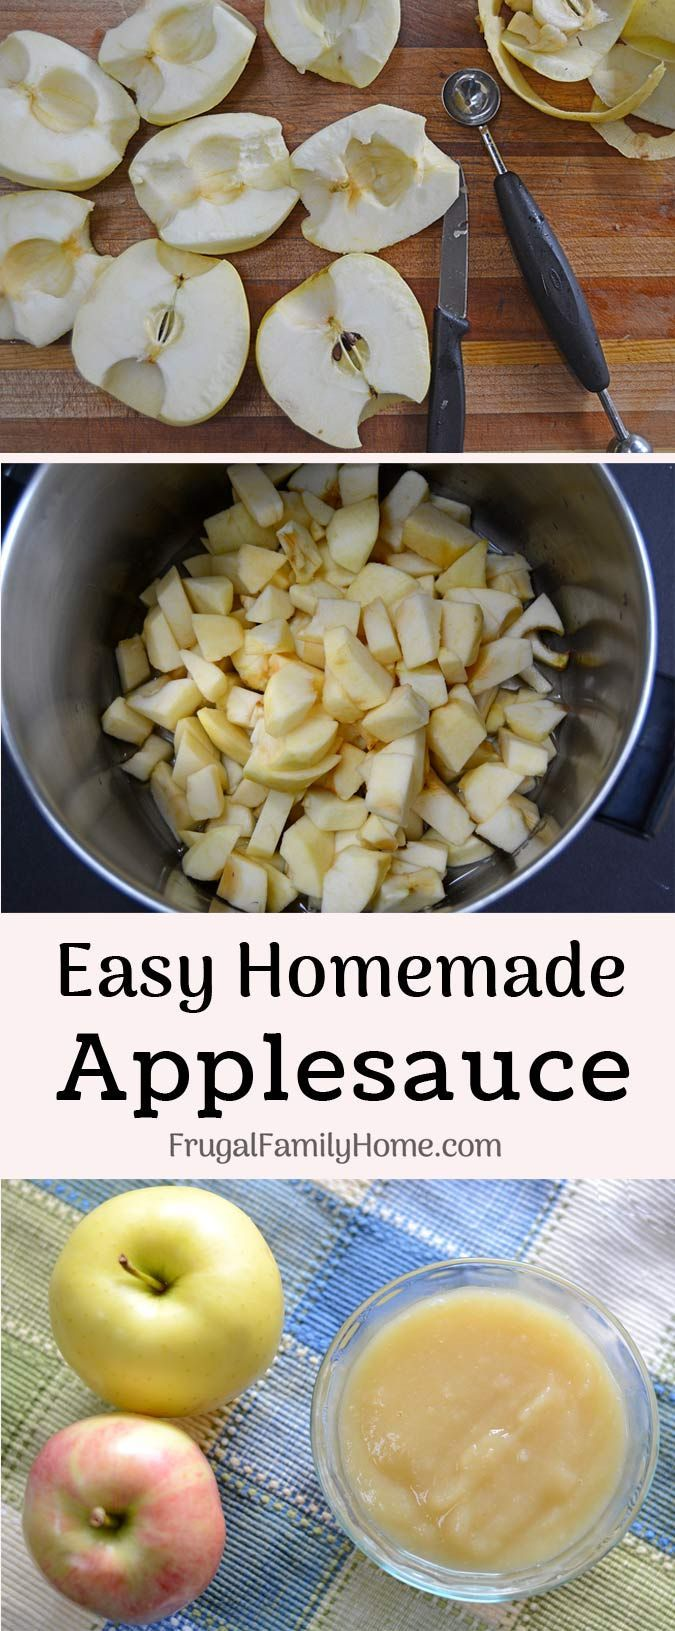 How to Make Homemade Applesauce, Easy | Recipe | Homemade ...